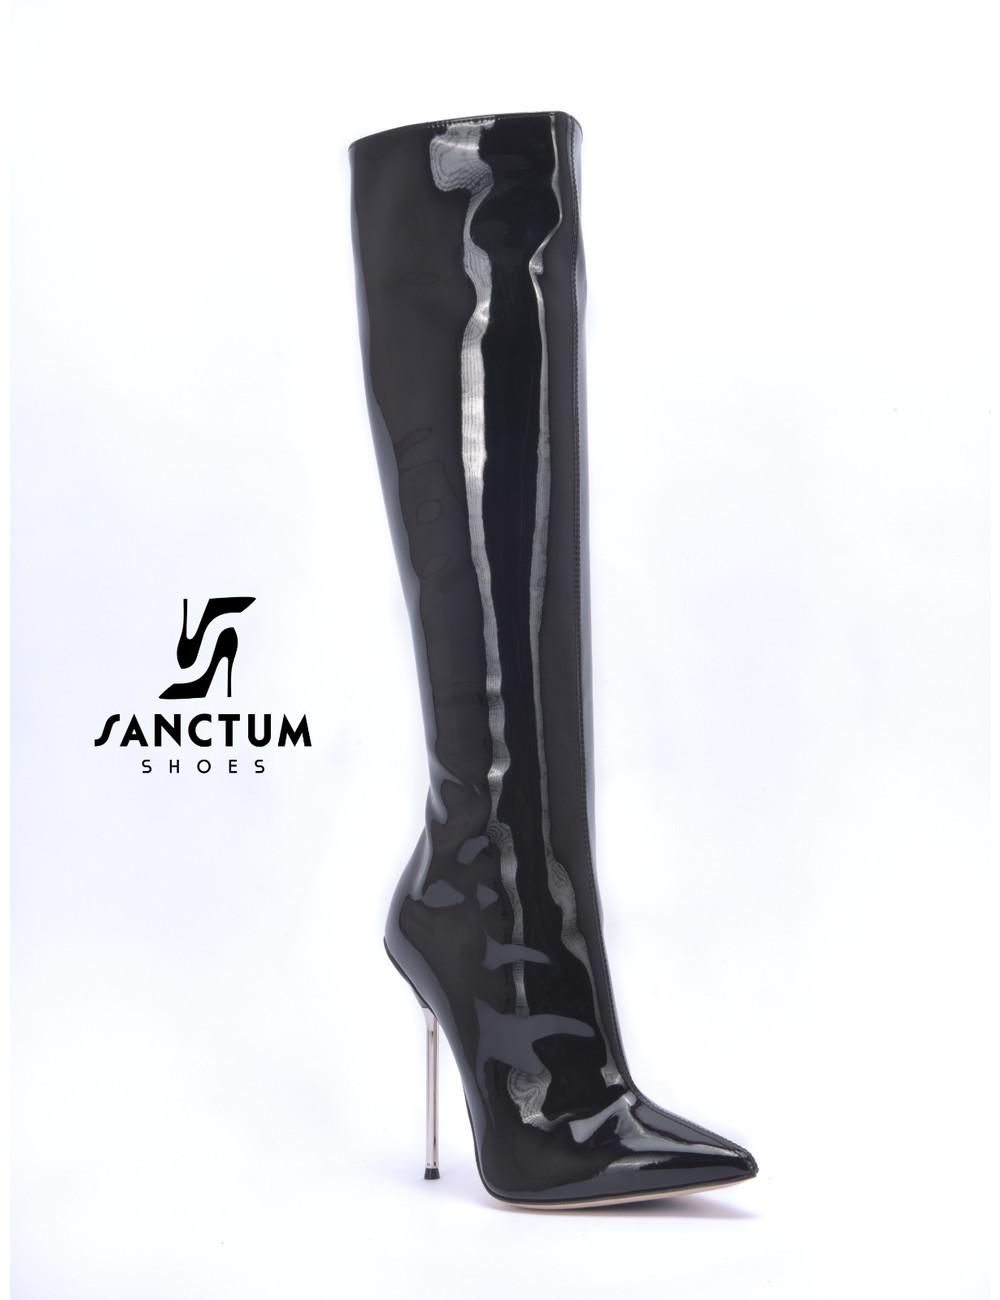 Sanctum  High Italian knee boots GAIA with stiletto heels in genuine patent leather